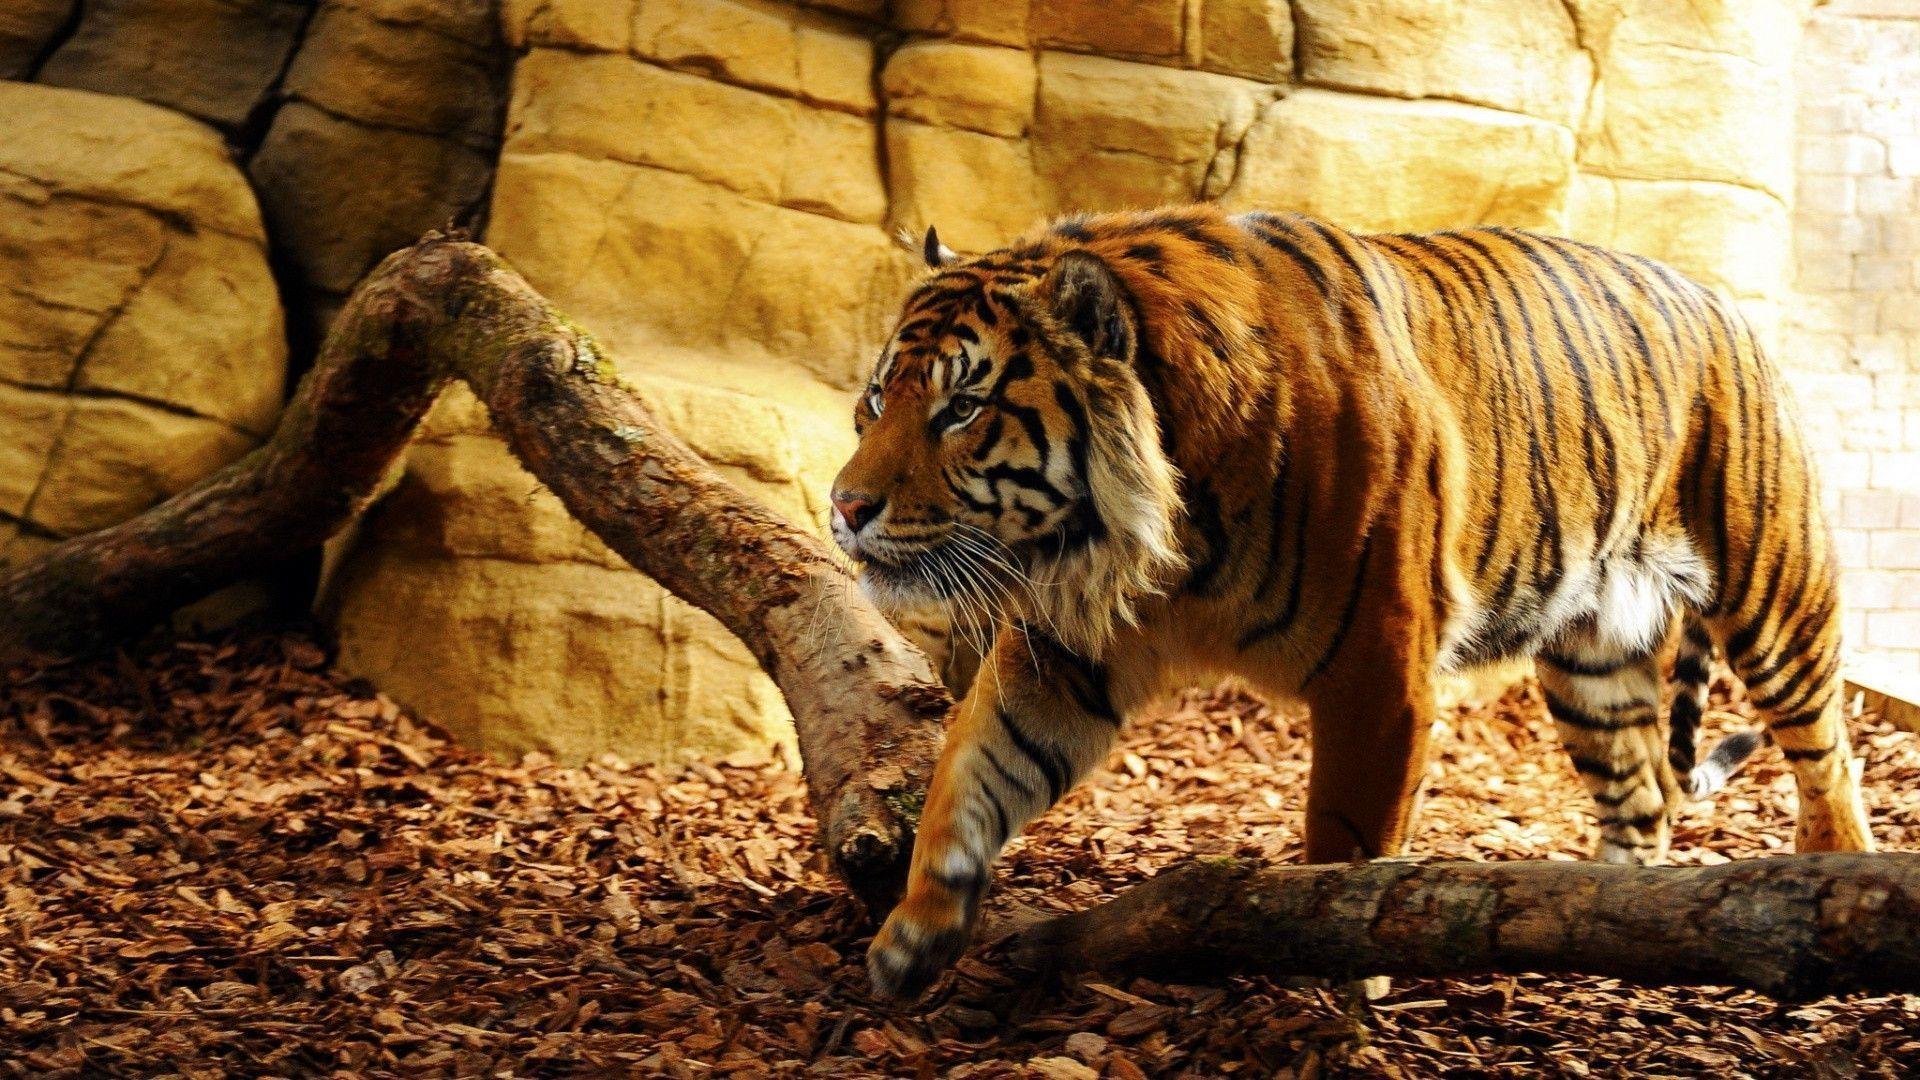 Tiger Wallpapers - HD Wallpapers Inn